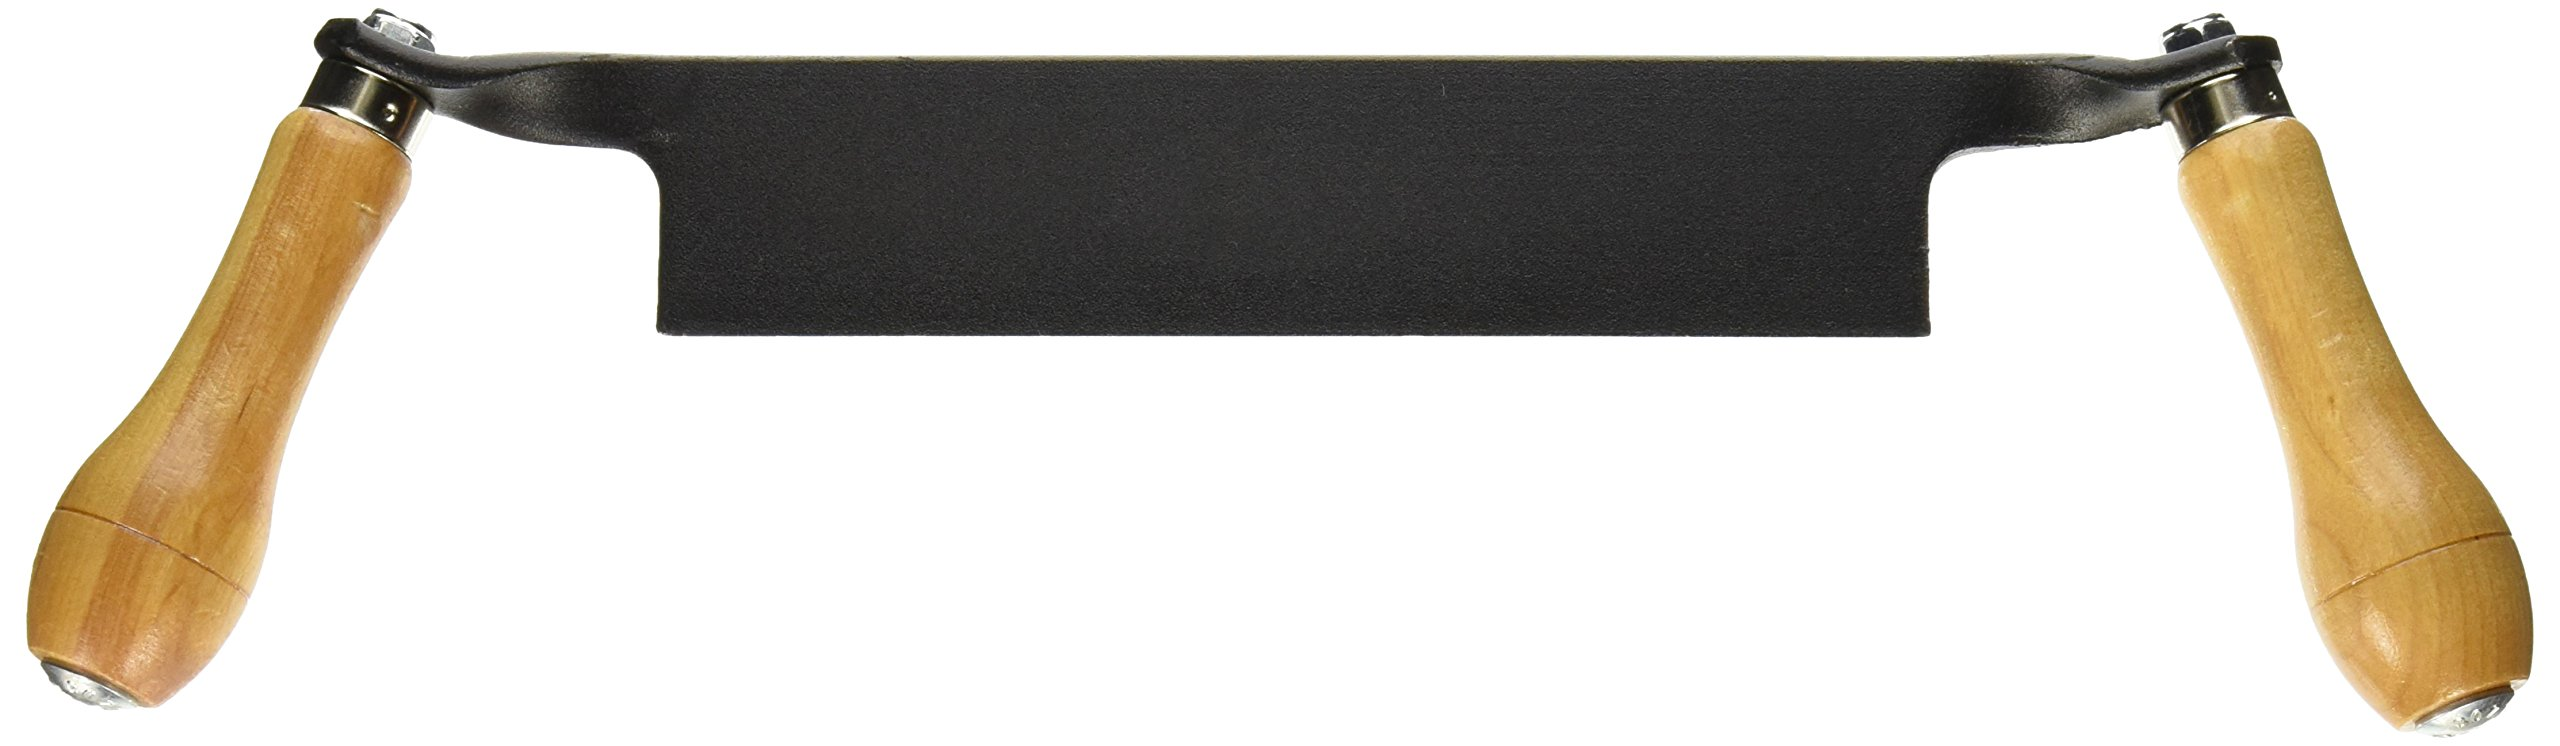 COLUMBUS MCKINNON/DIXIE 49941 8-Inch Wood Carver Draw Shave